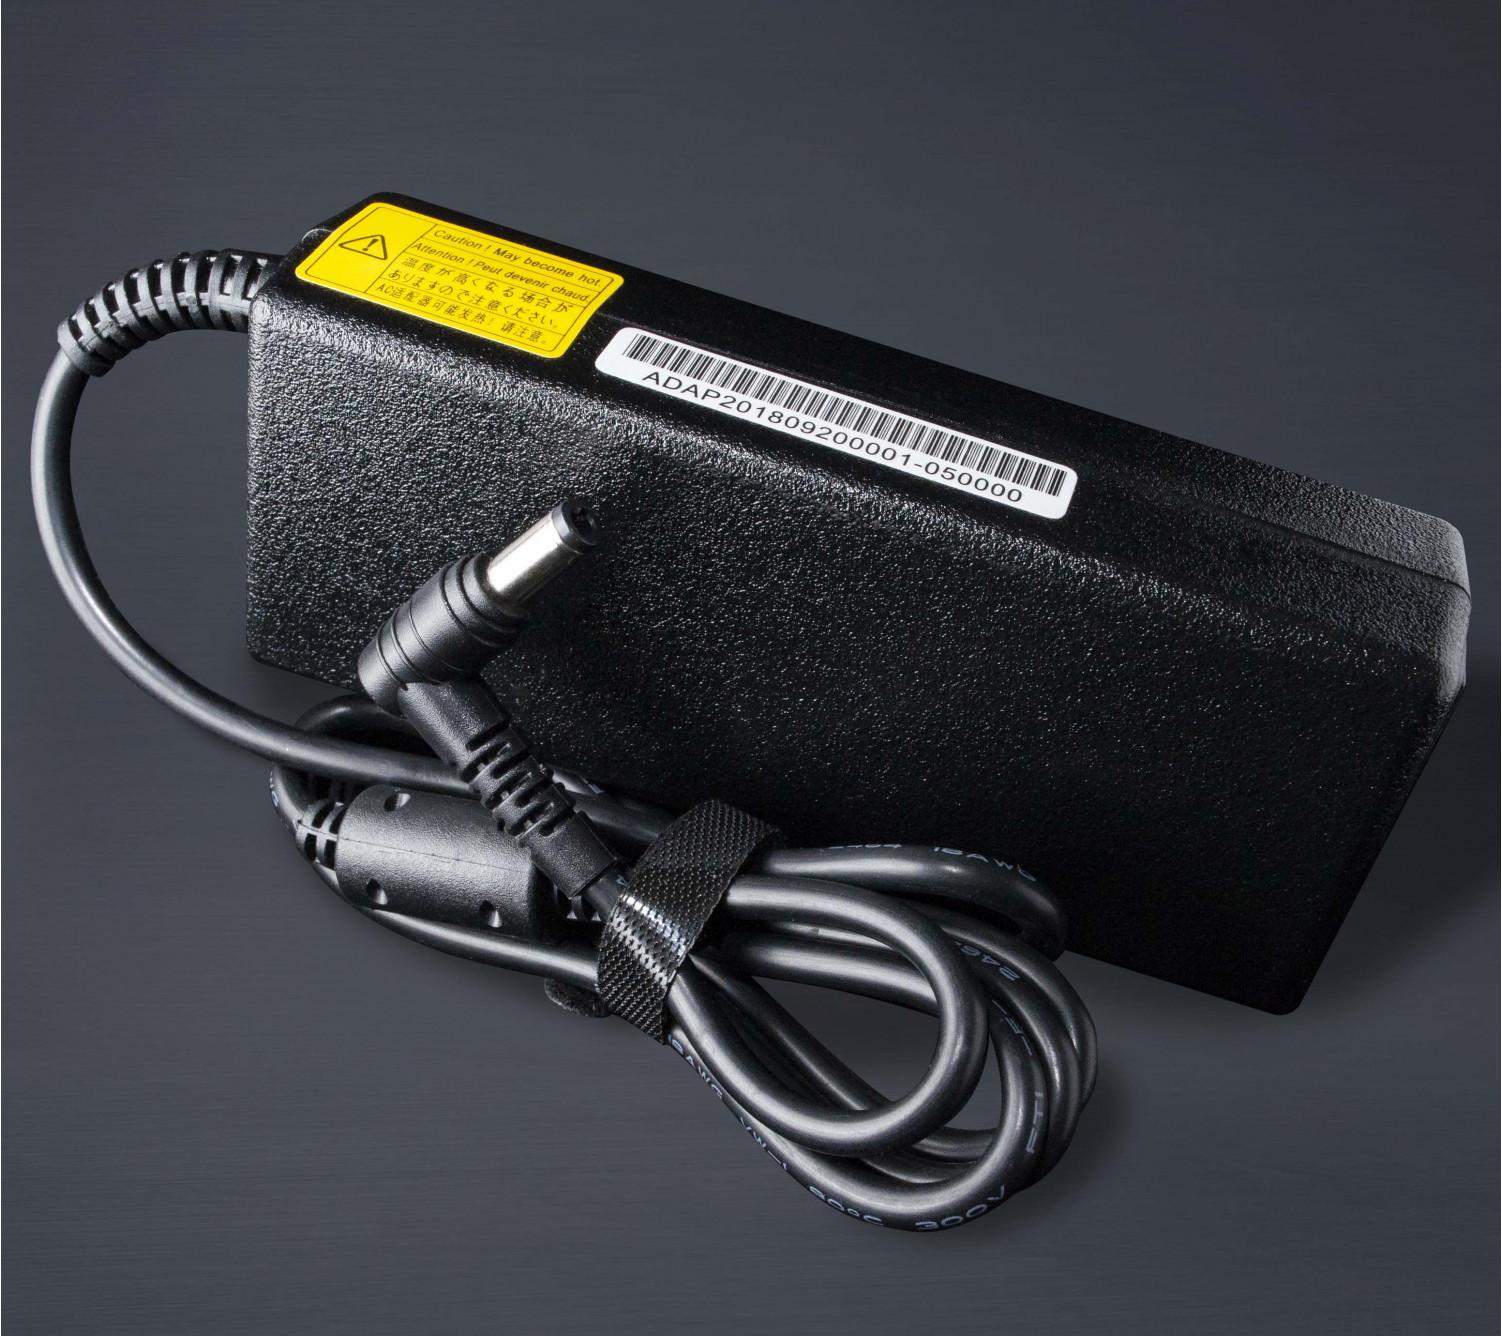 Блок питания Frime для ноутбука Fujitsu 90W (5.5 х 2.5)